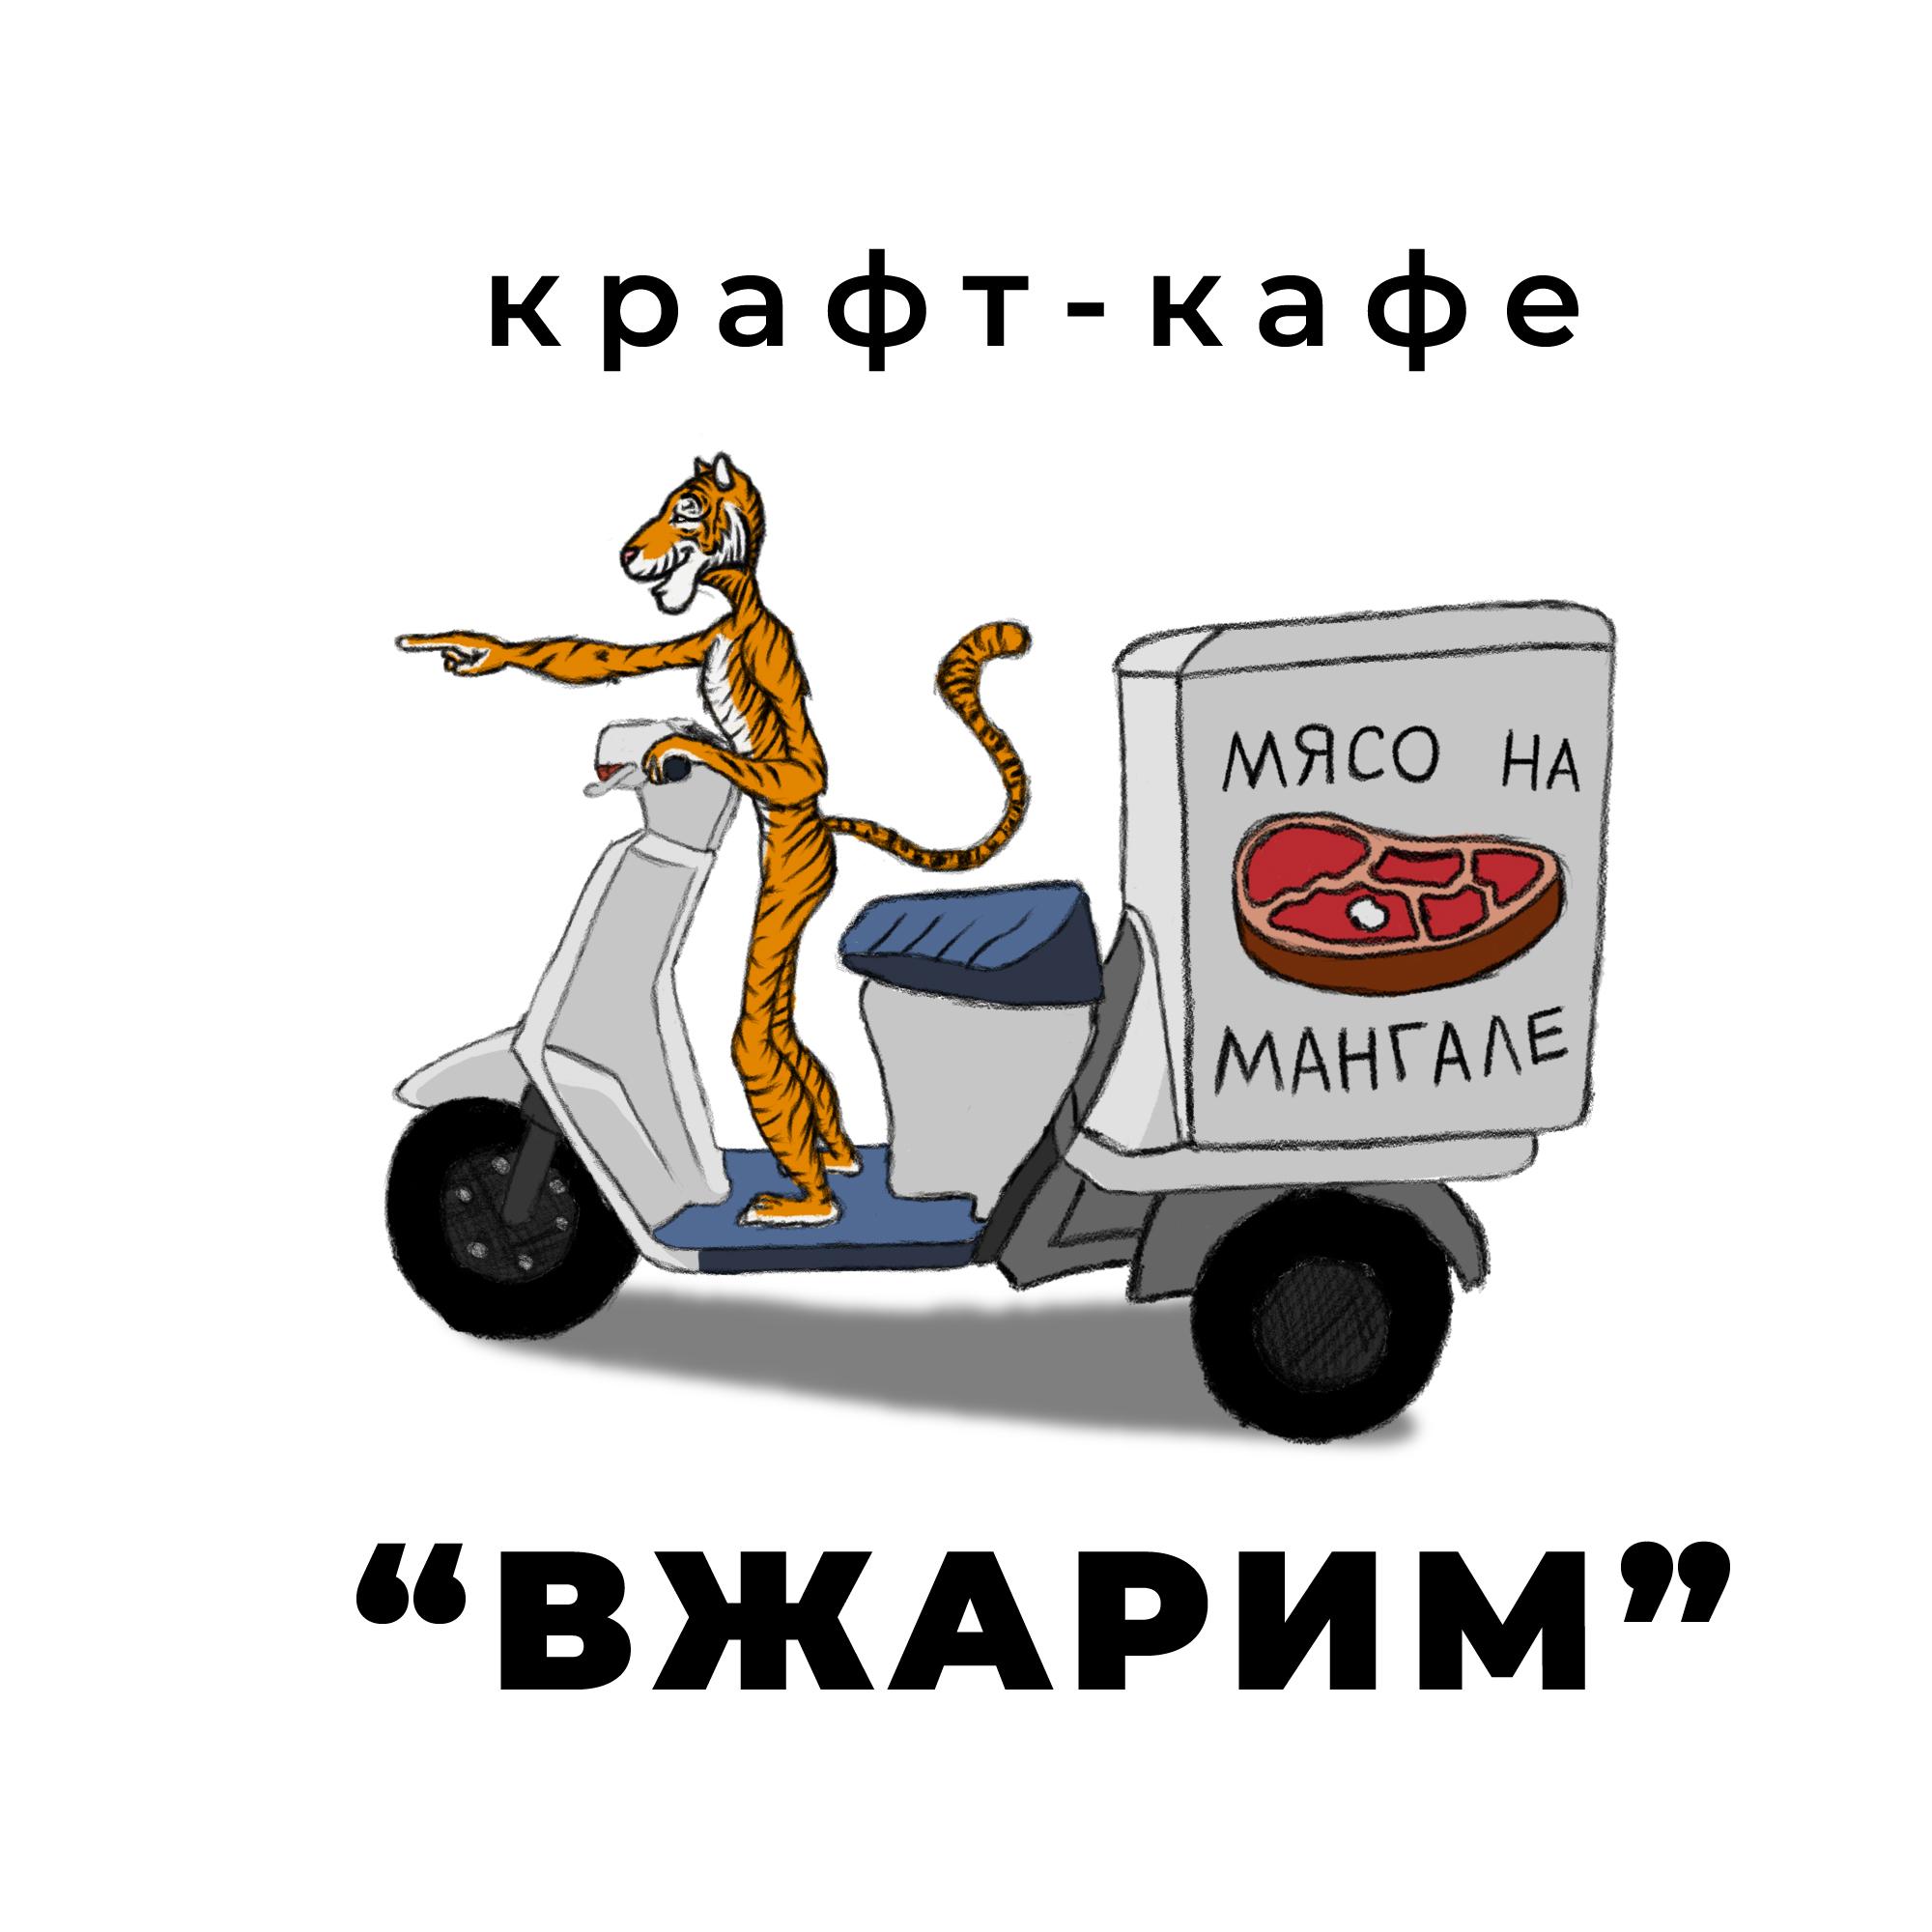 Требуется, разработка логотипа для крафт-кафе «ВЖАРИМ». фото f_544600c41d3de615.jpg